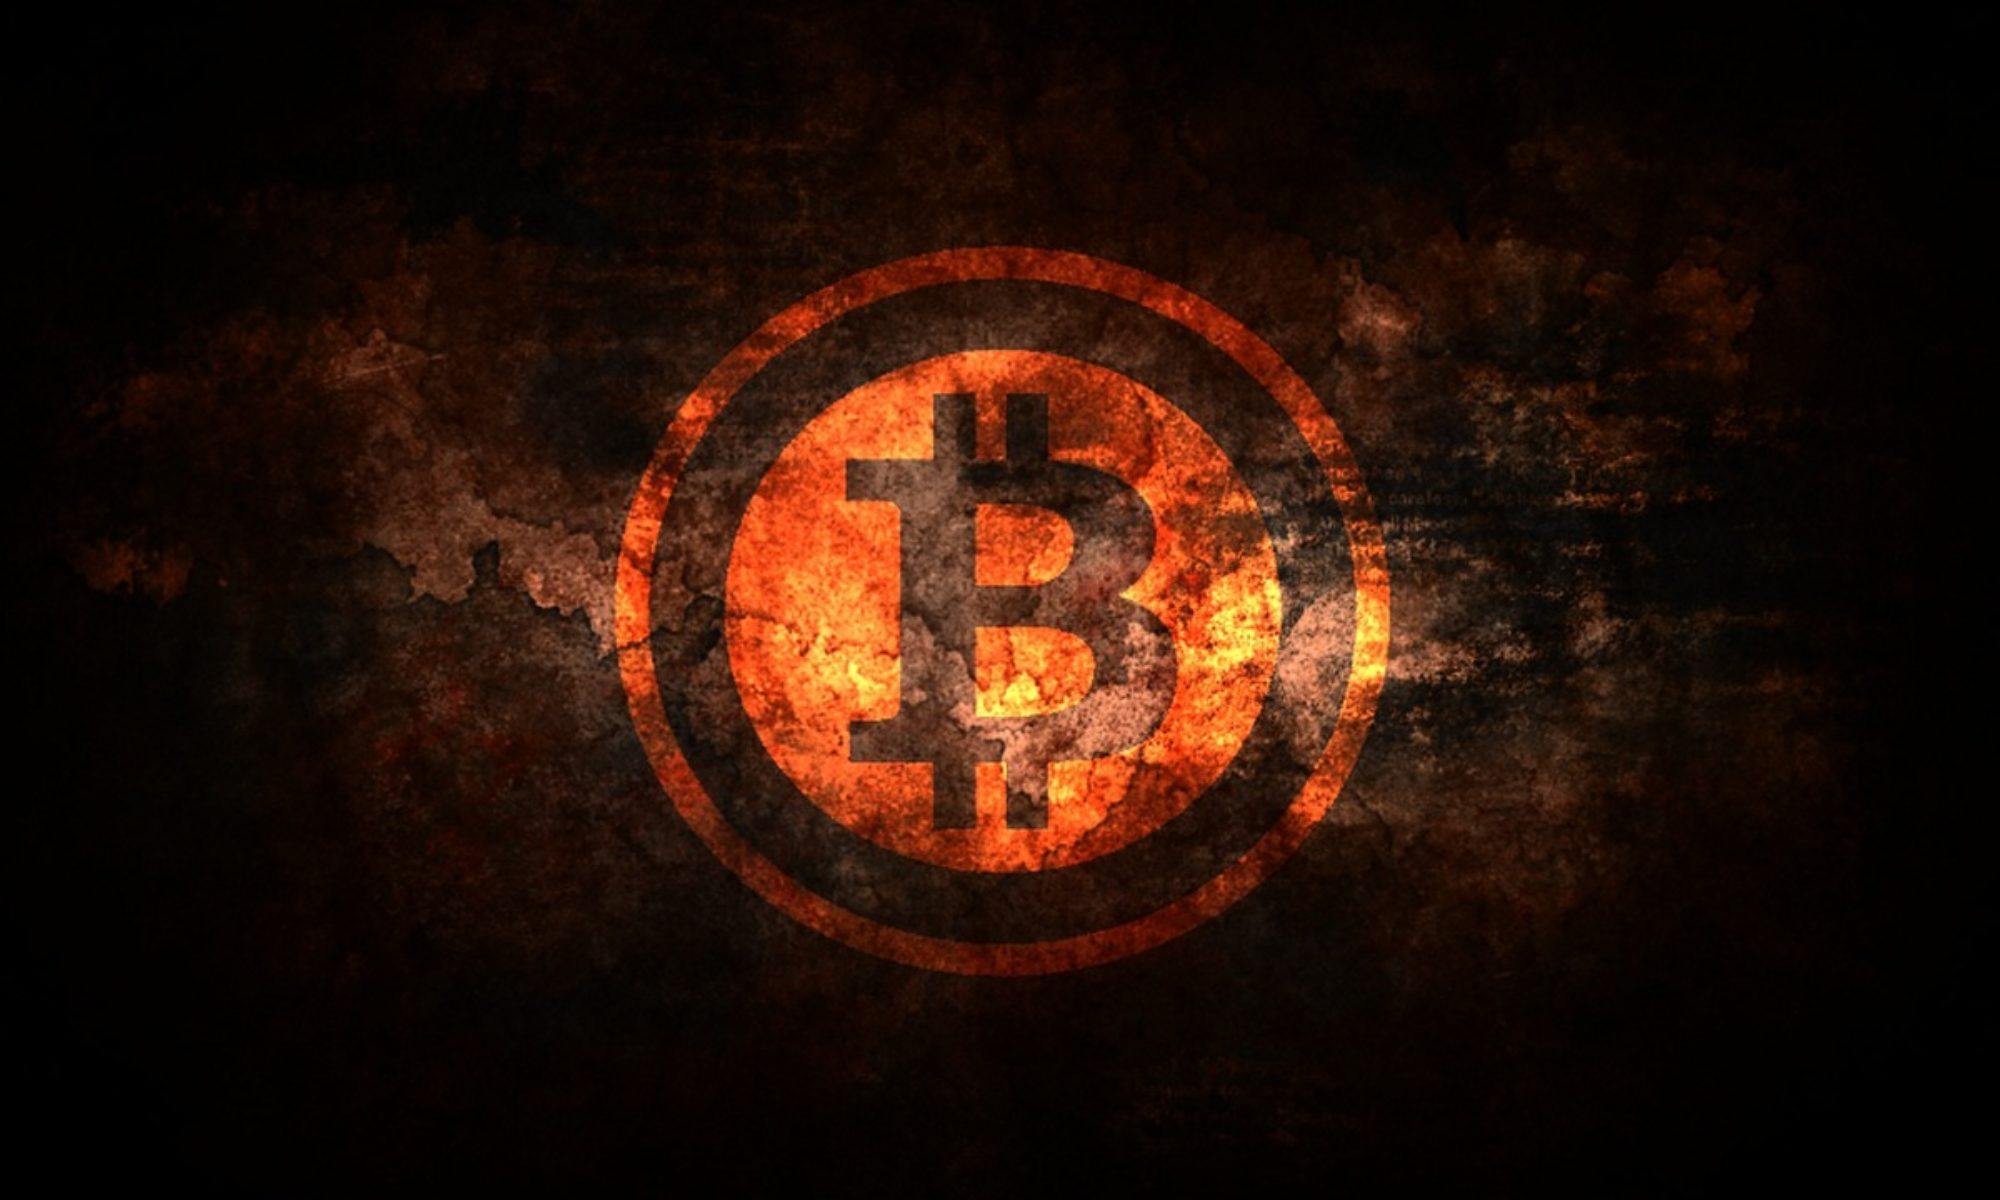 Bitcoin global canada inc well teach you how bitcoin is changing bitcoin global canada inc ccuart Images